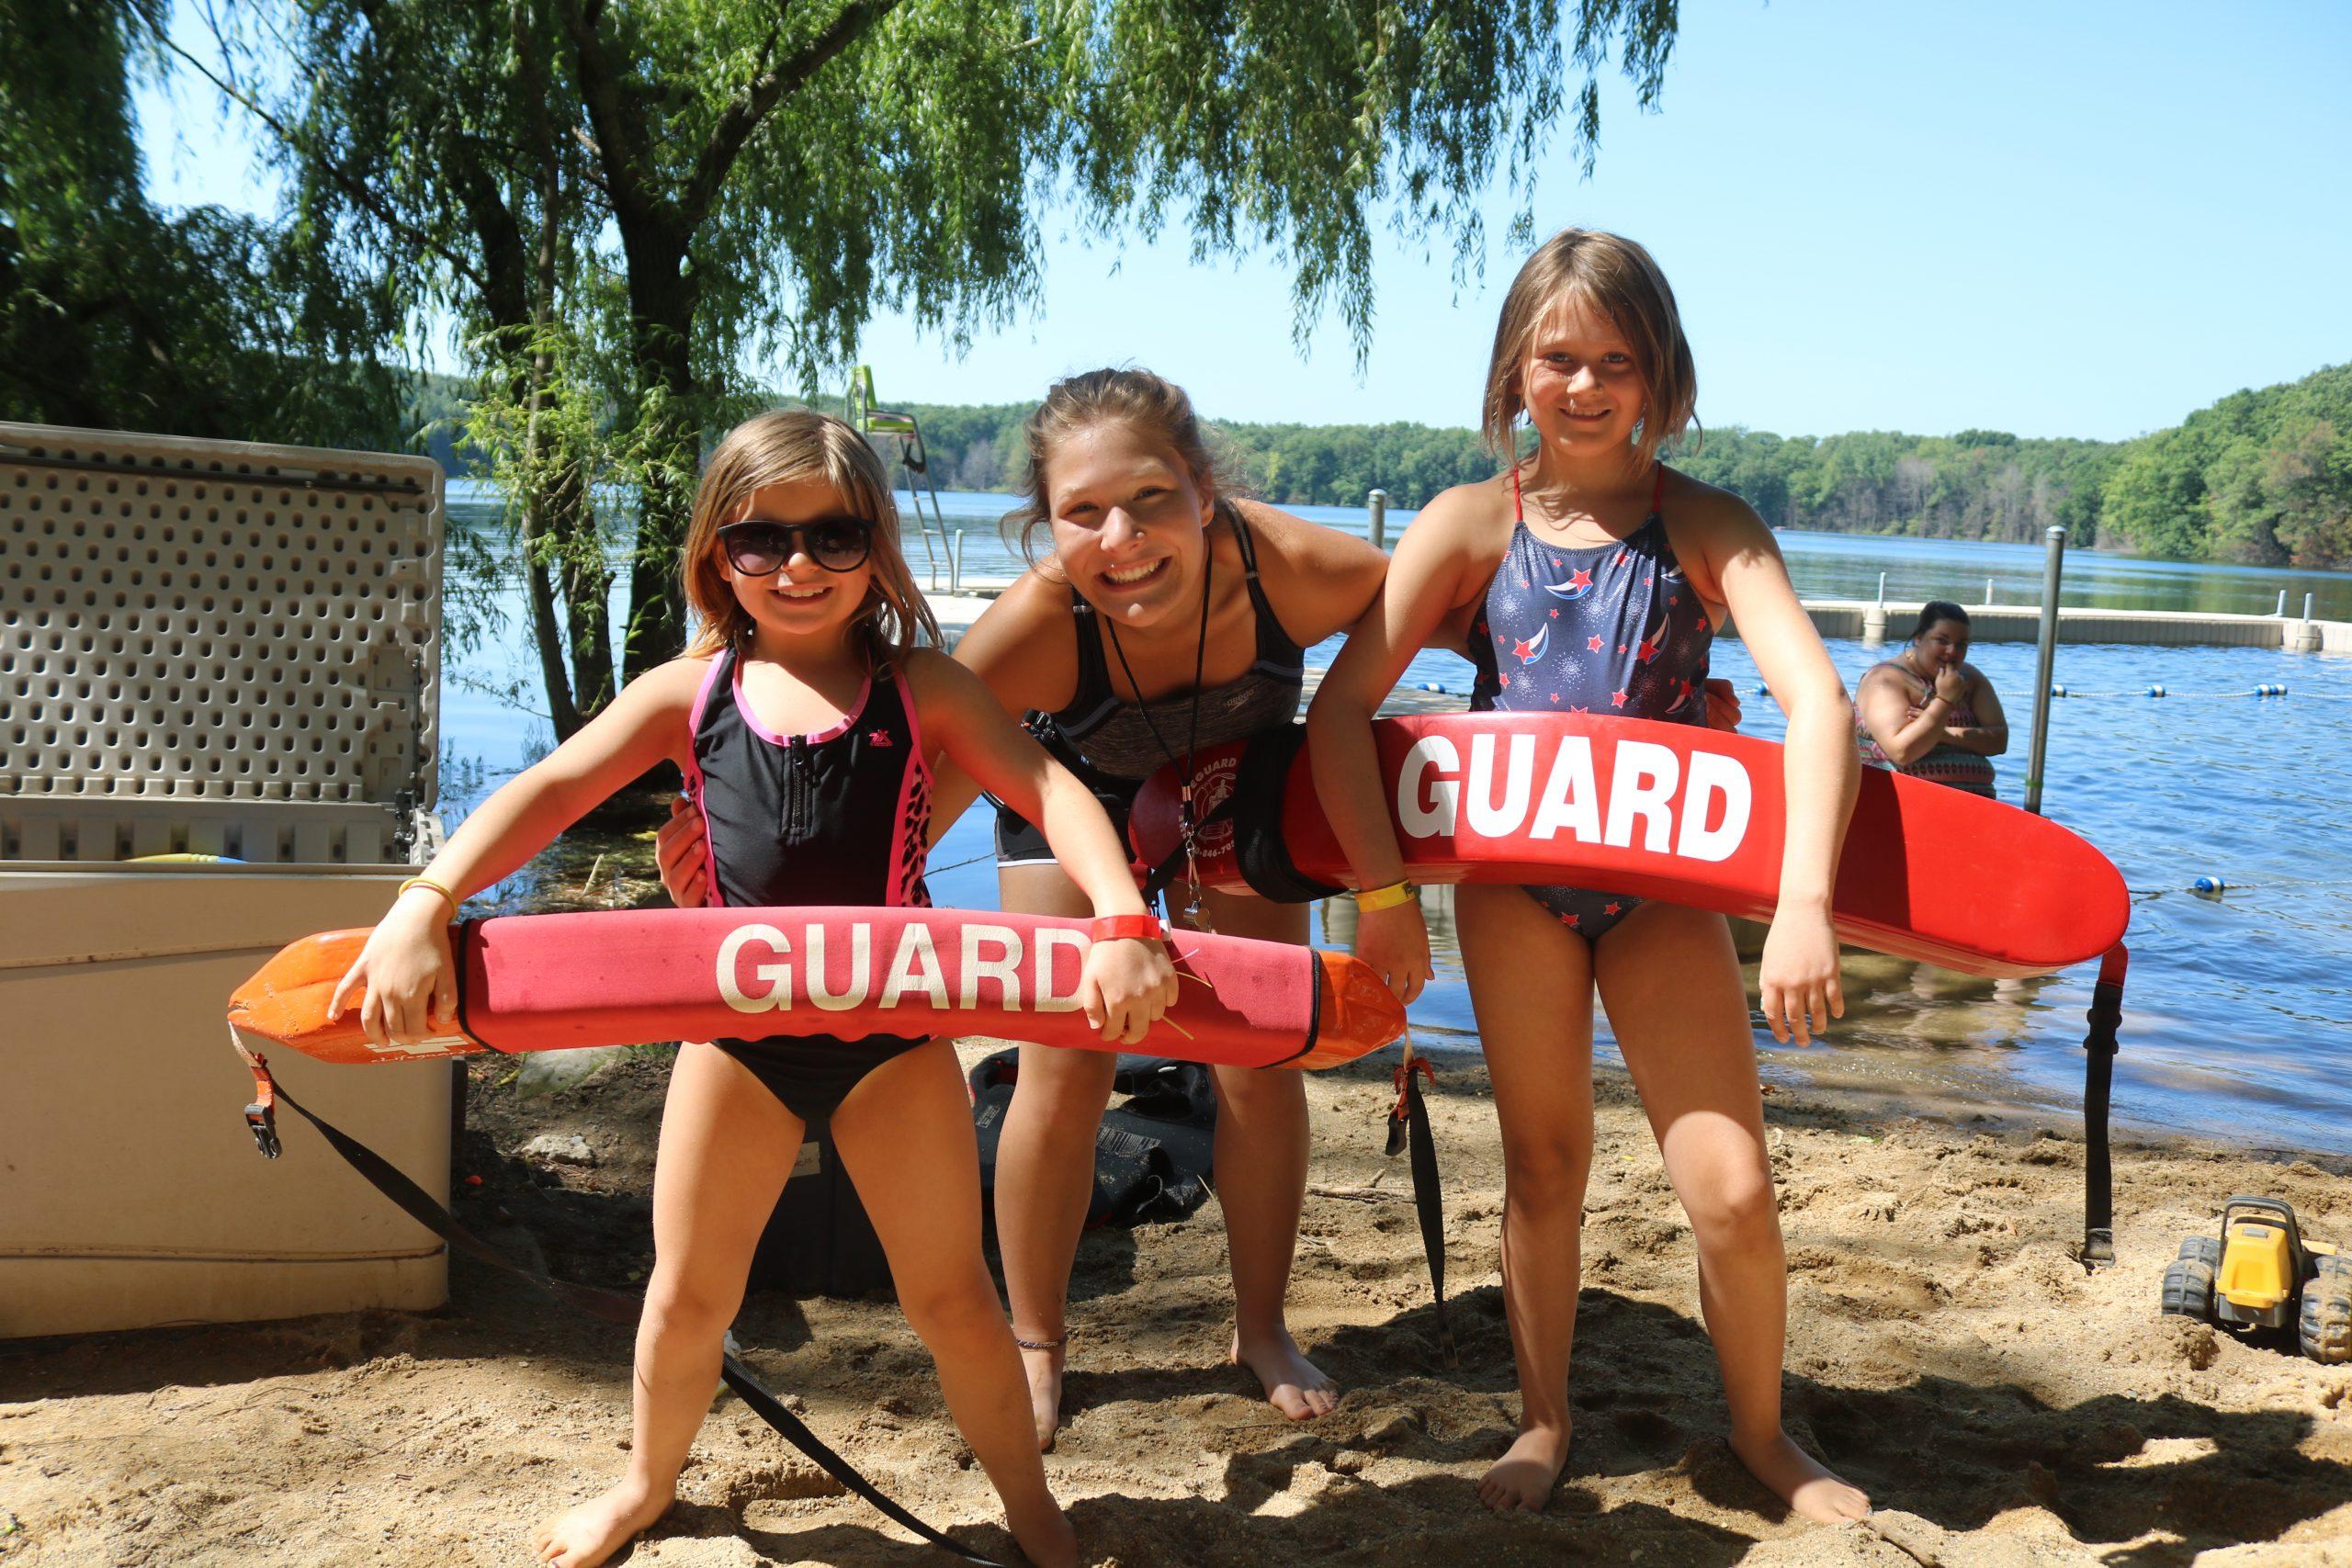 Pretty Lake Camp has lifeguards and future lifeguards